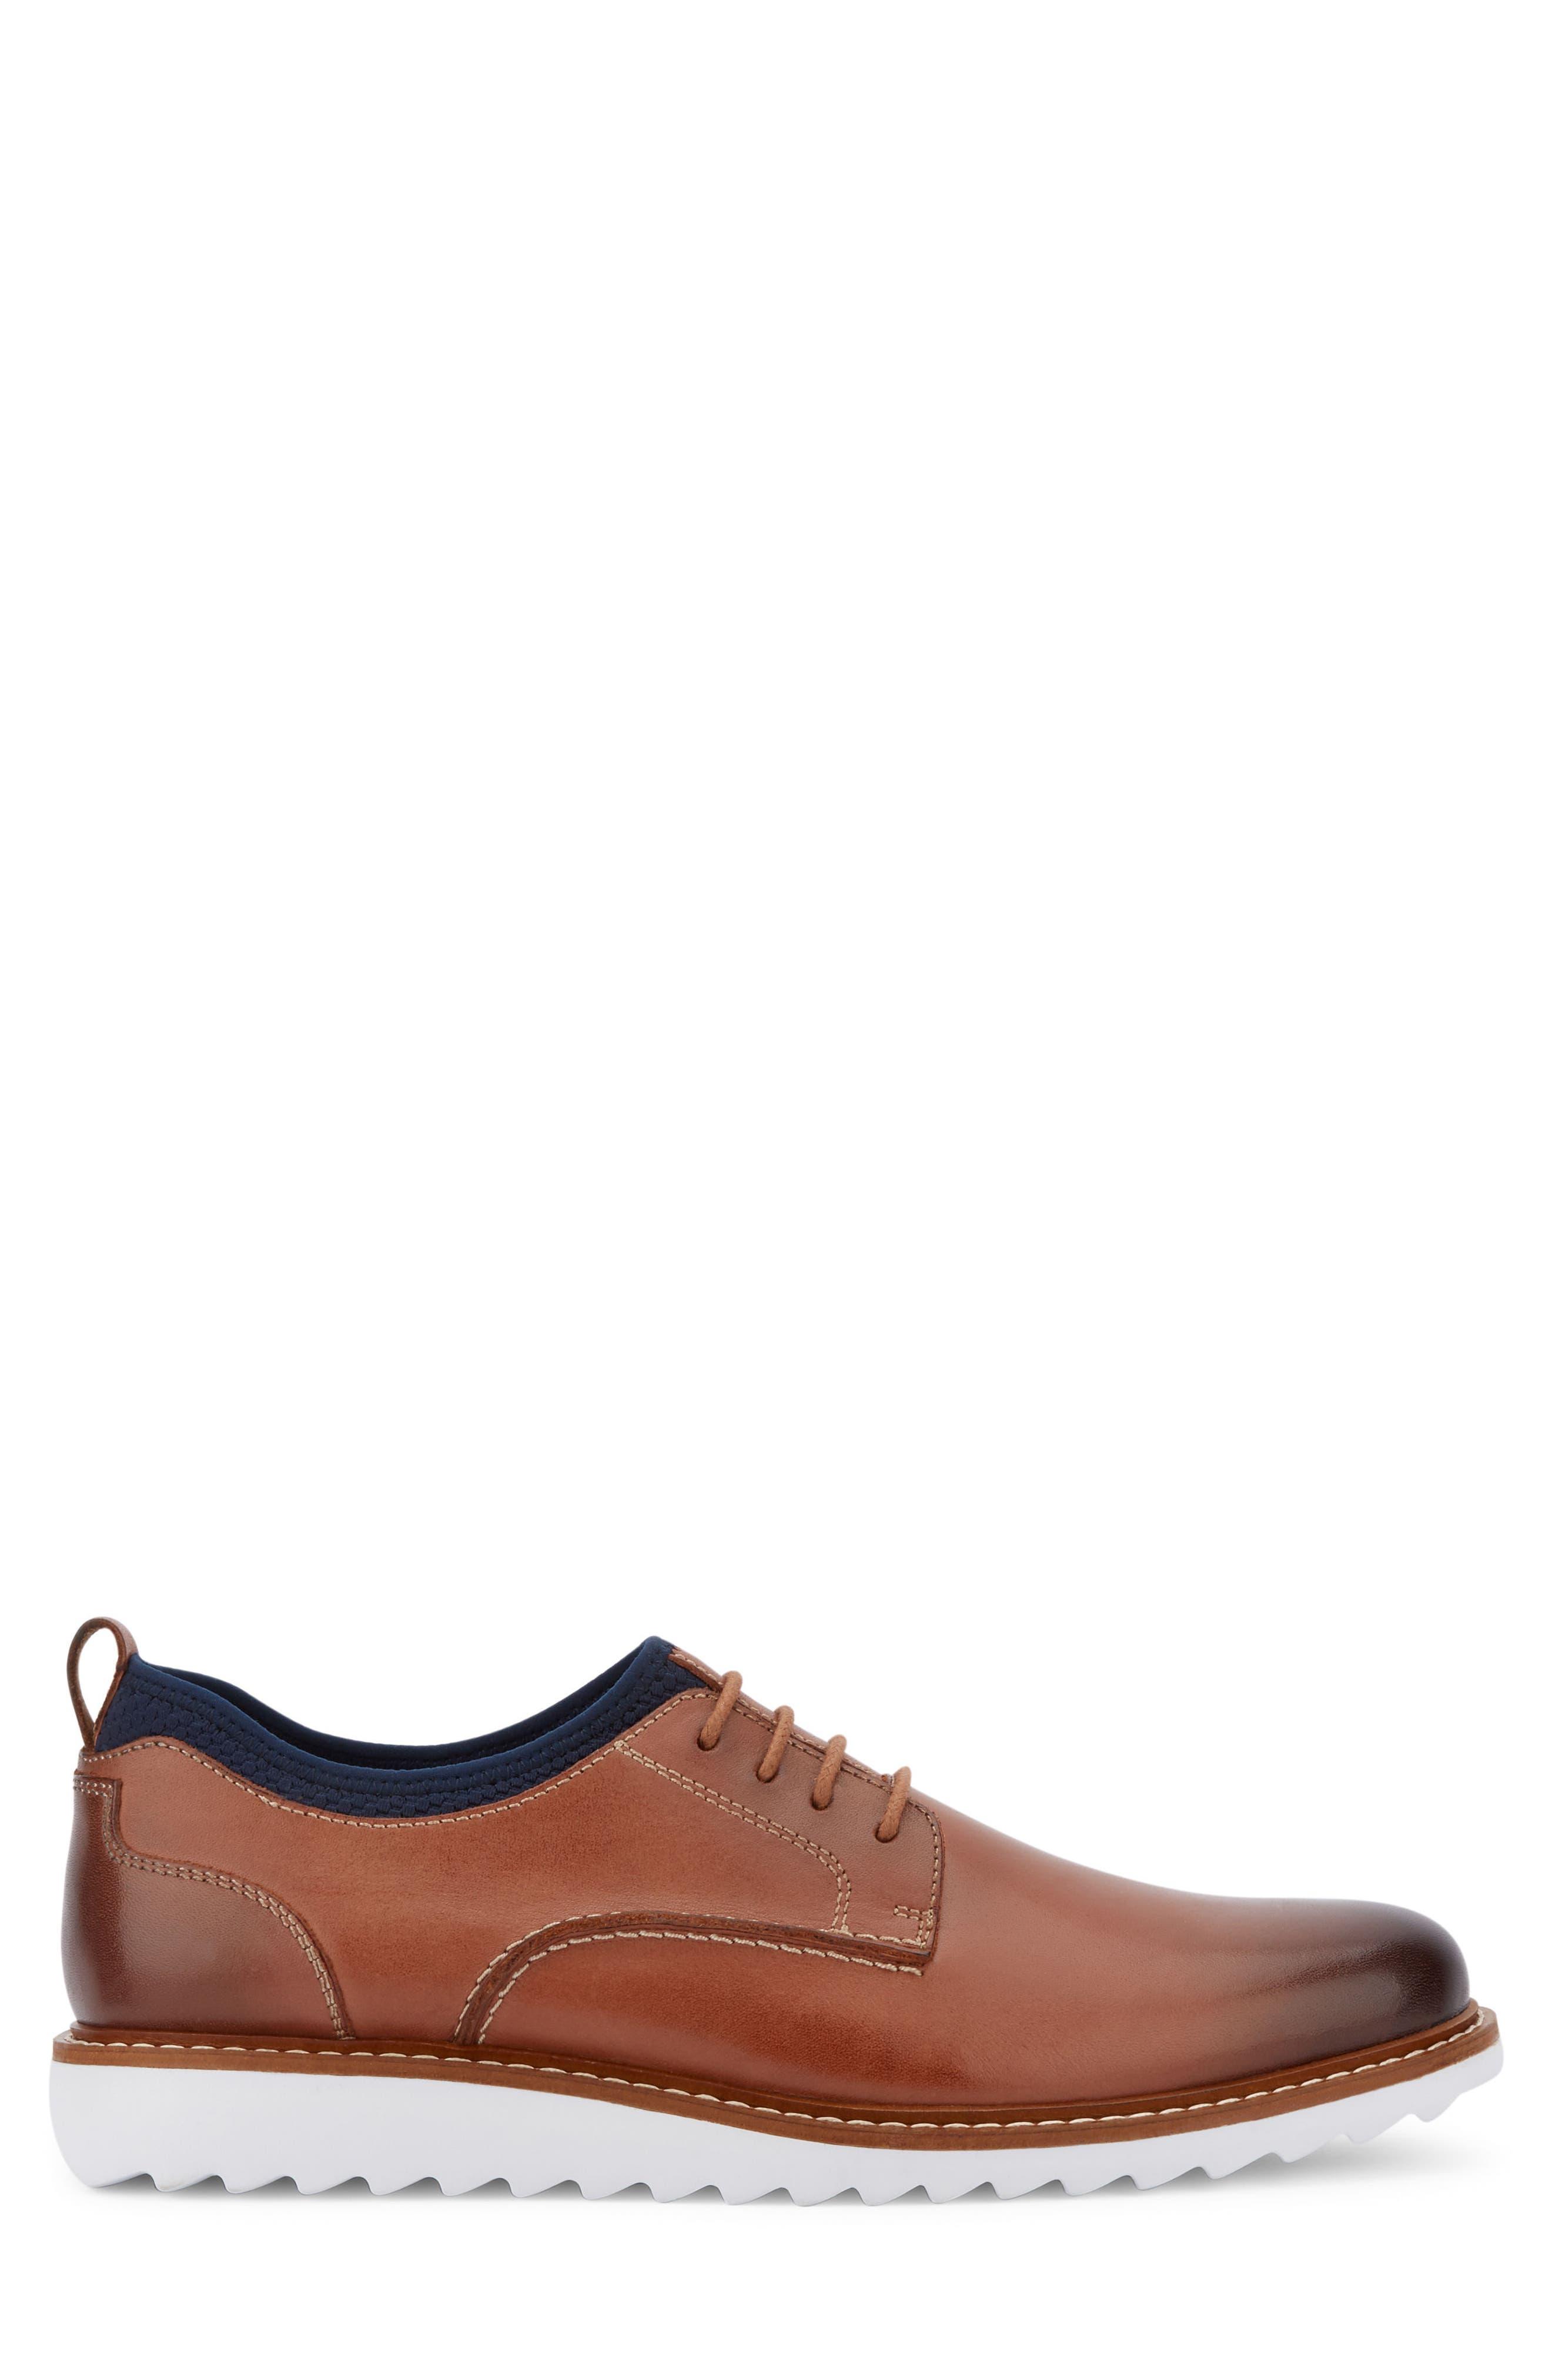 Buck 2.0 Plain Toe Derby,                             Alternate thumbnail 3, color,                             Tan Burnished Leather